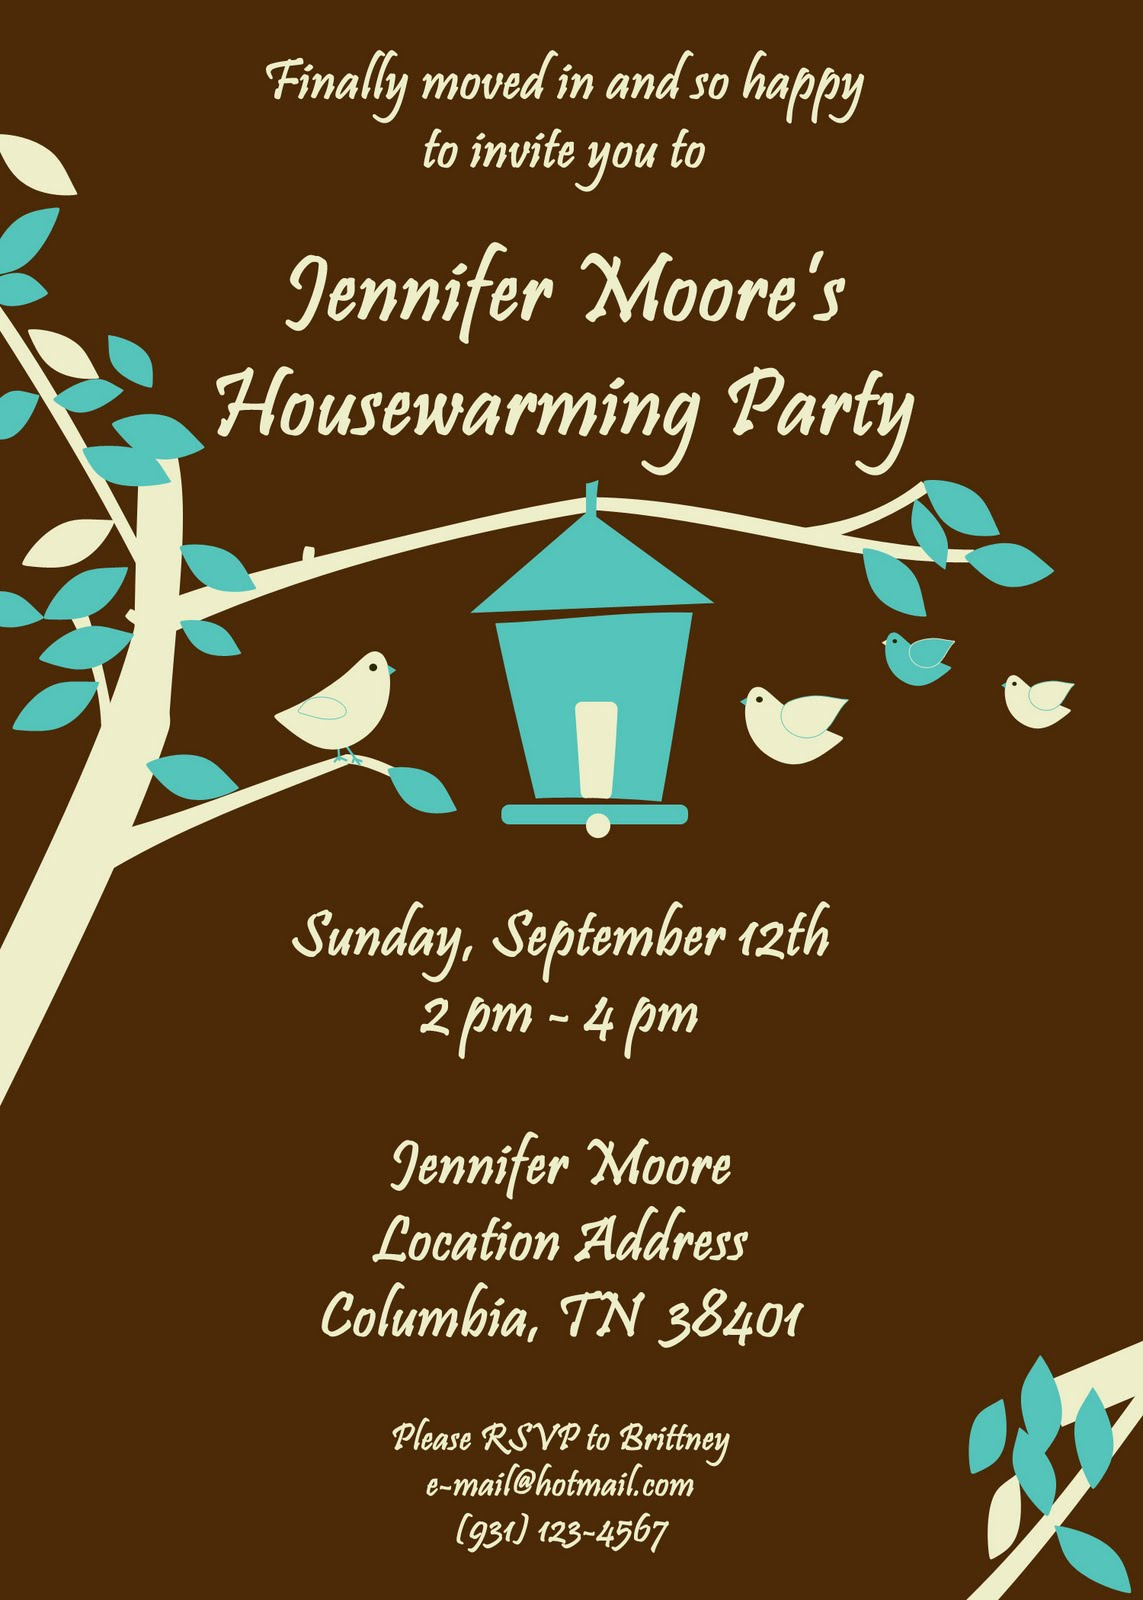 Fanci Cakes & More: Housewarming Party - Cake & Invitation